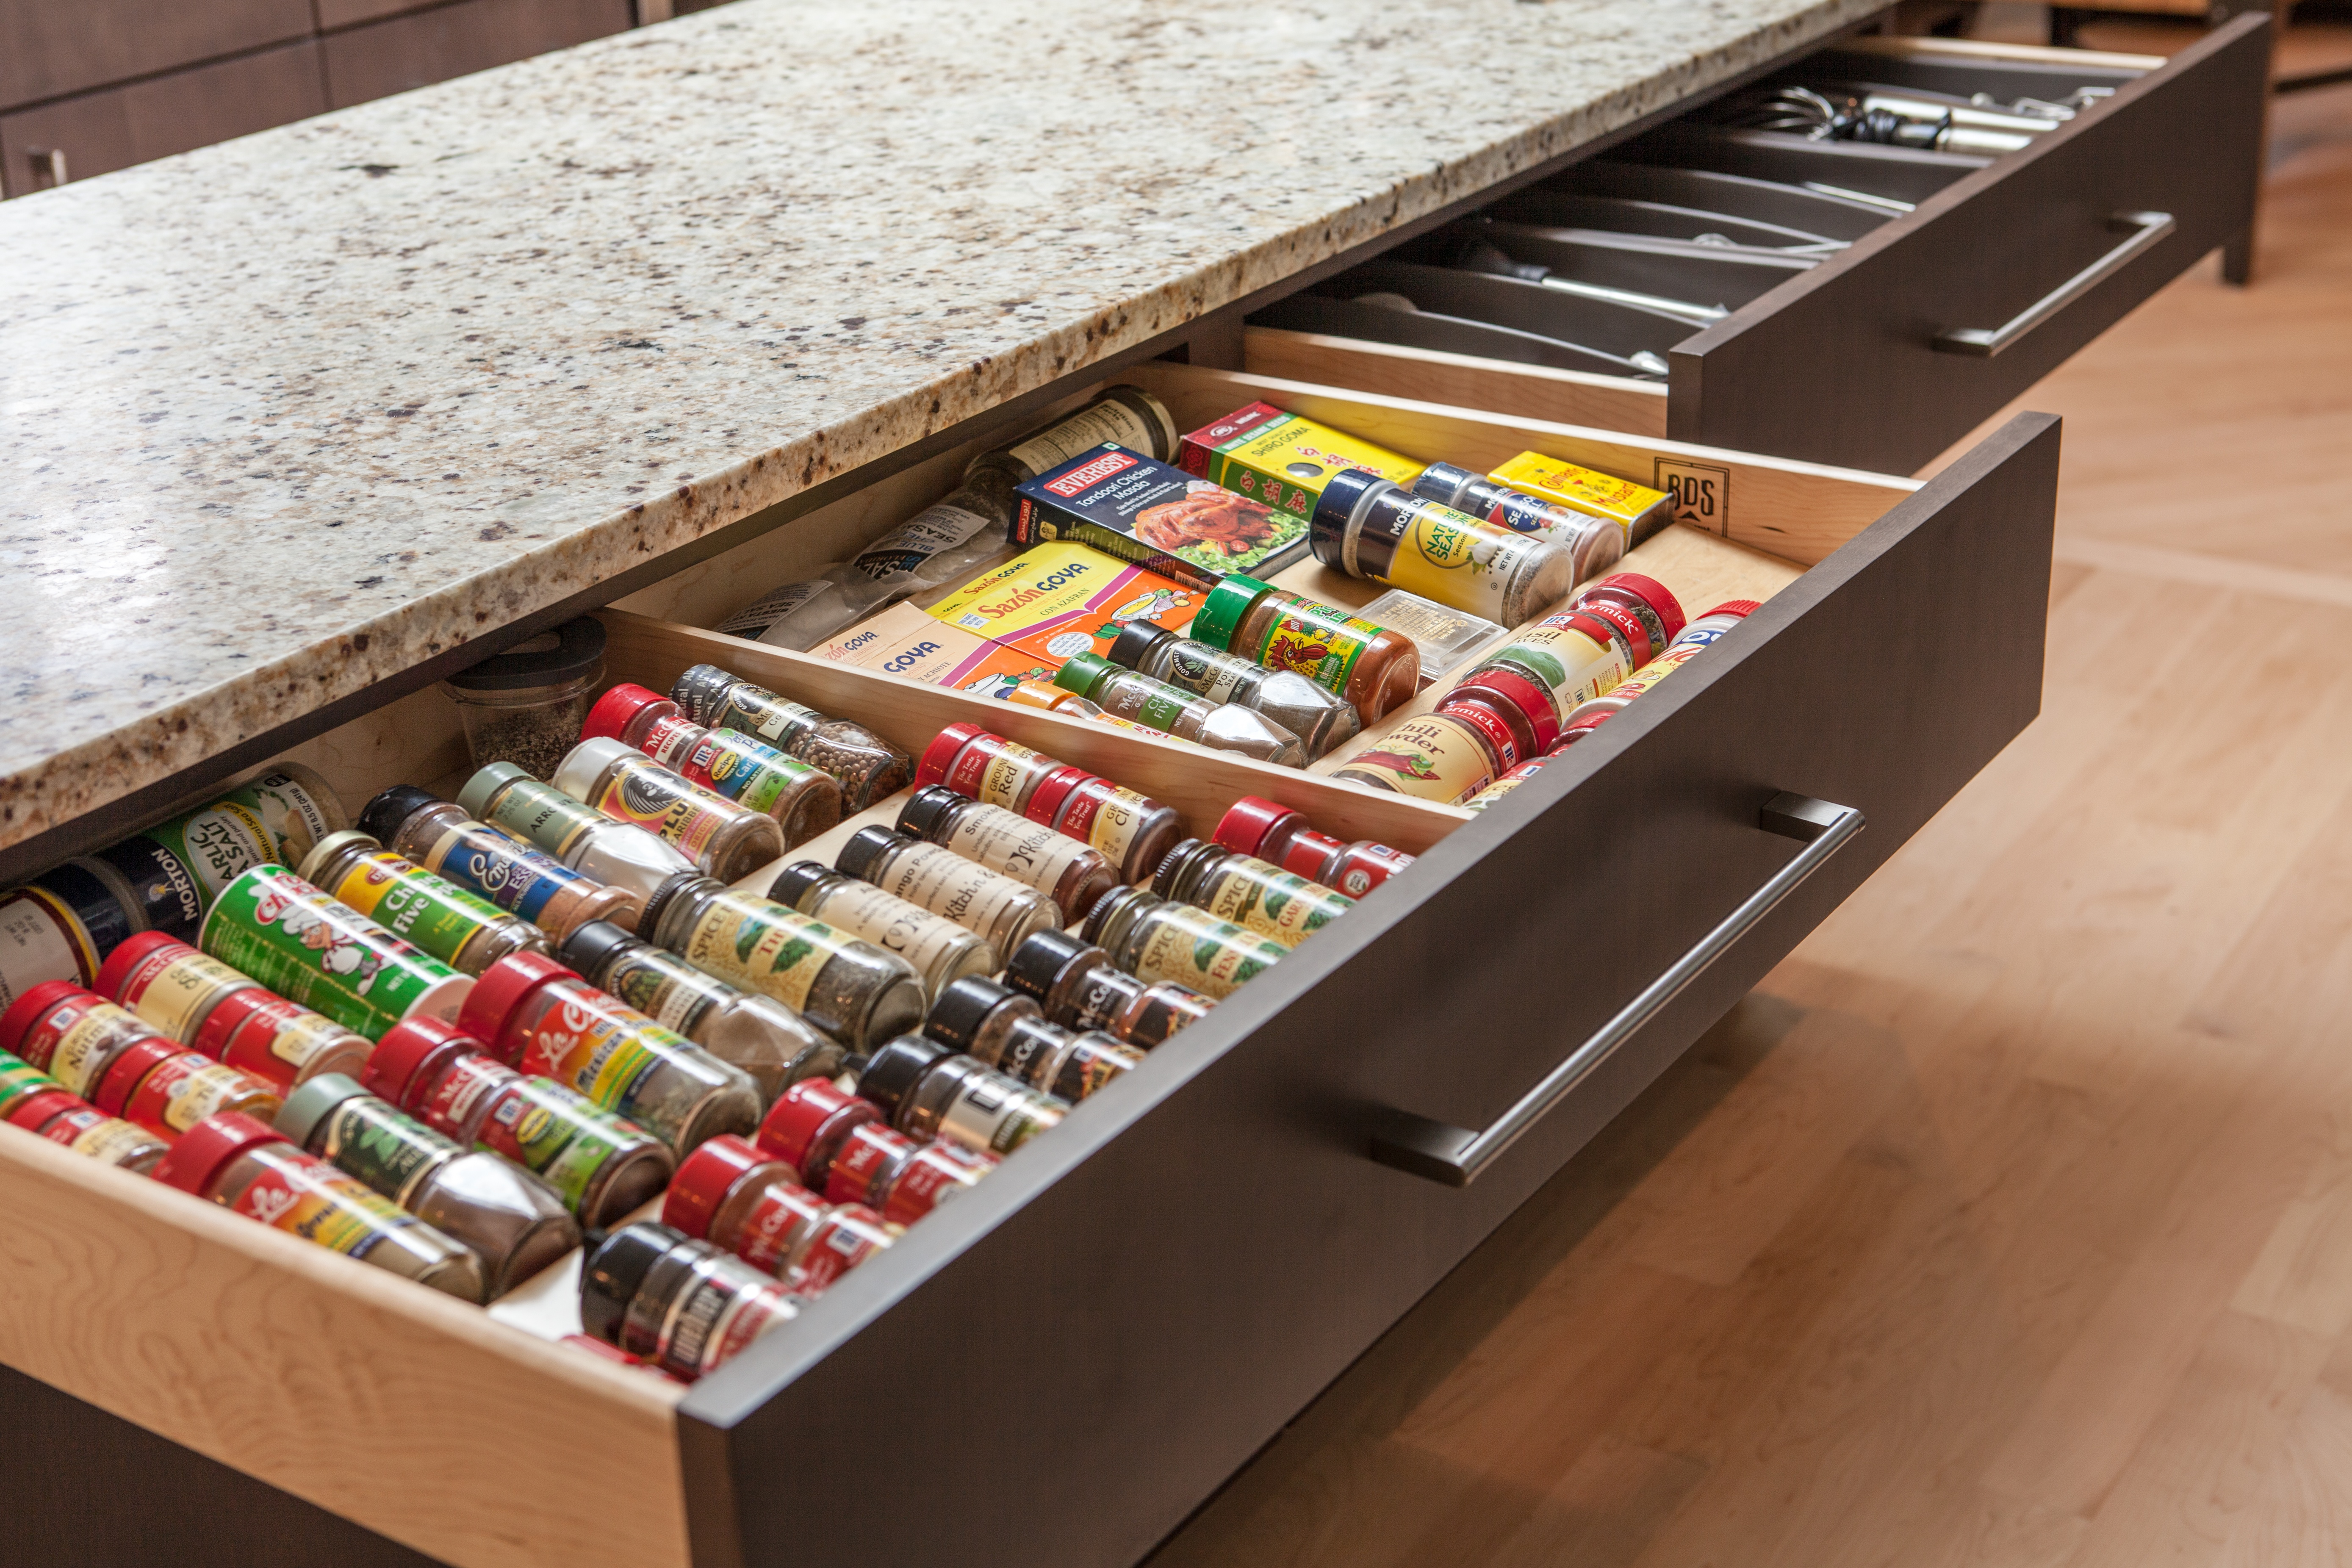 Spacious spice drawers